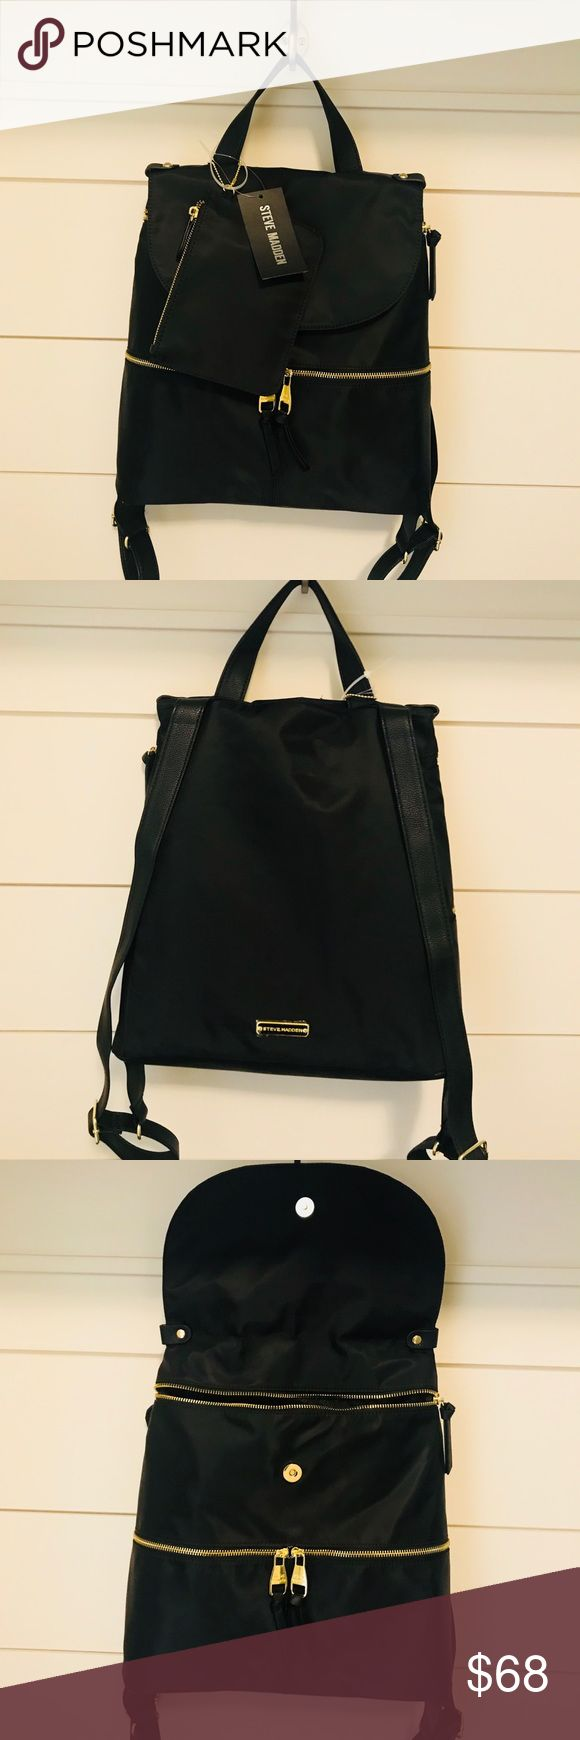 Steve Madden backpack Black Steve Madden backpack. Perfect size and lots of pockets! Steve Madden Bags Backpacks